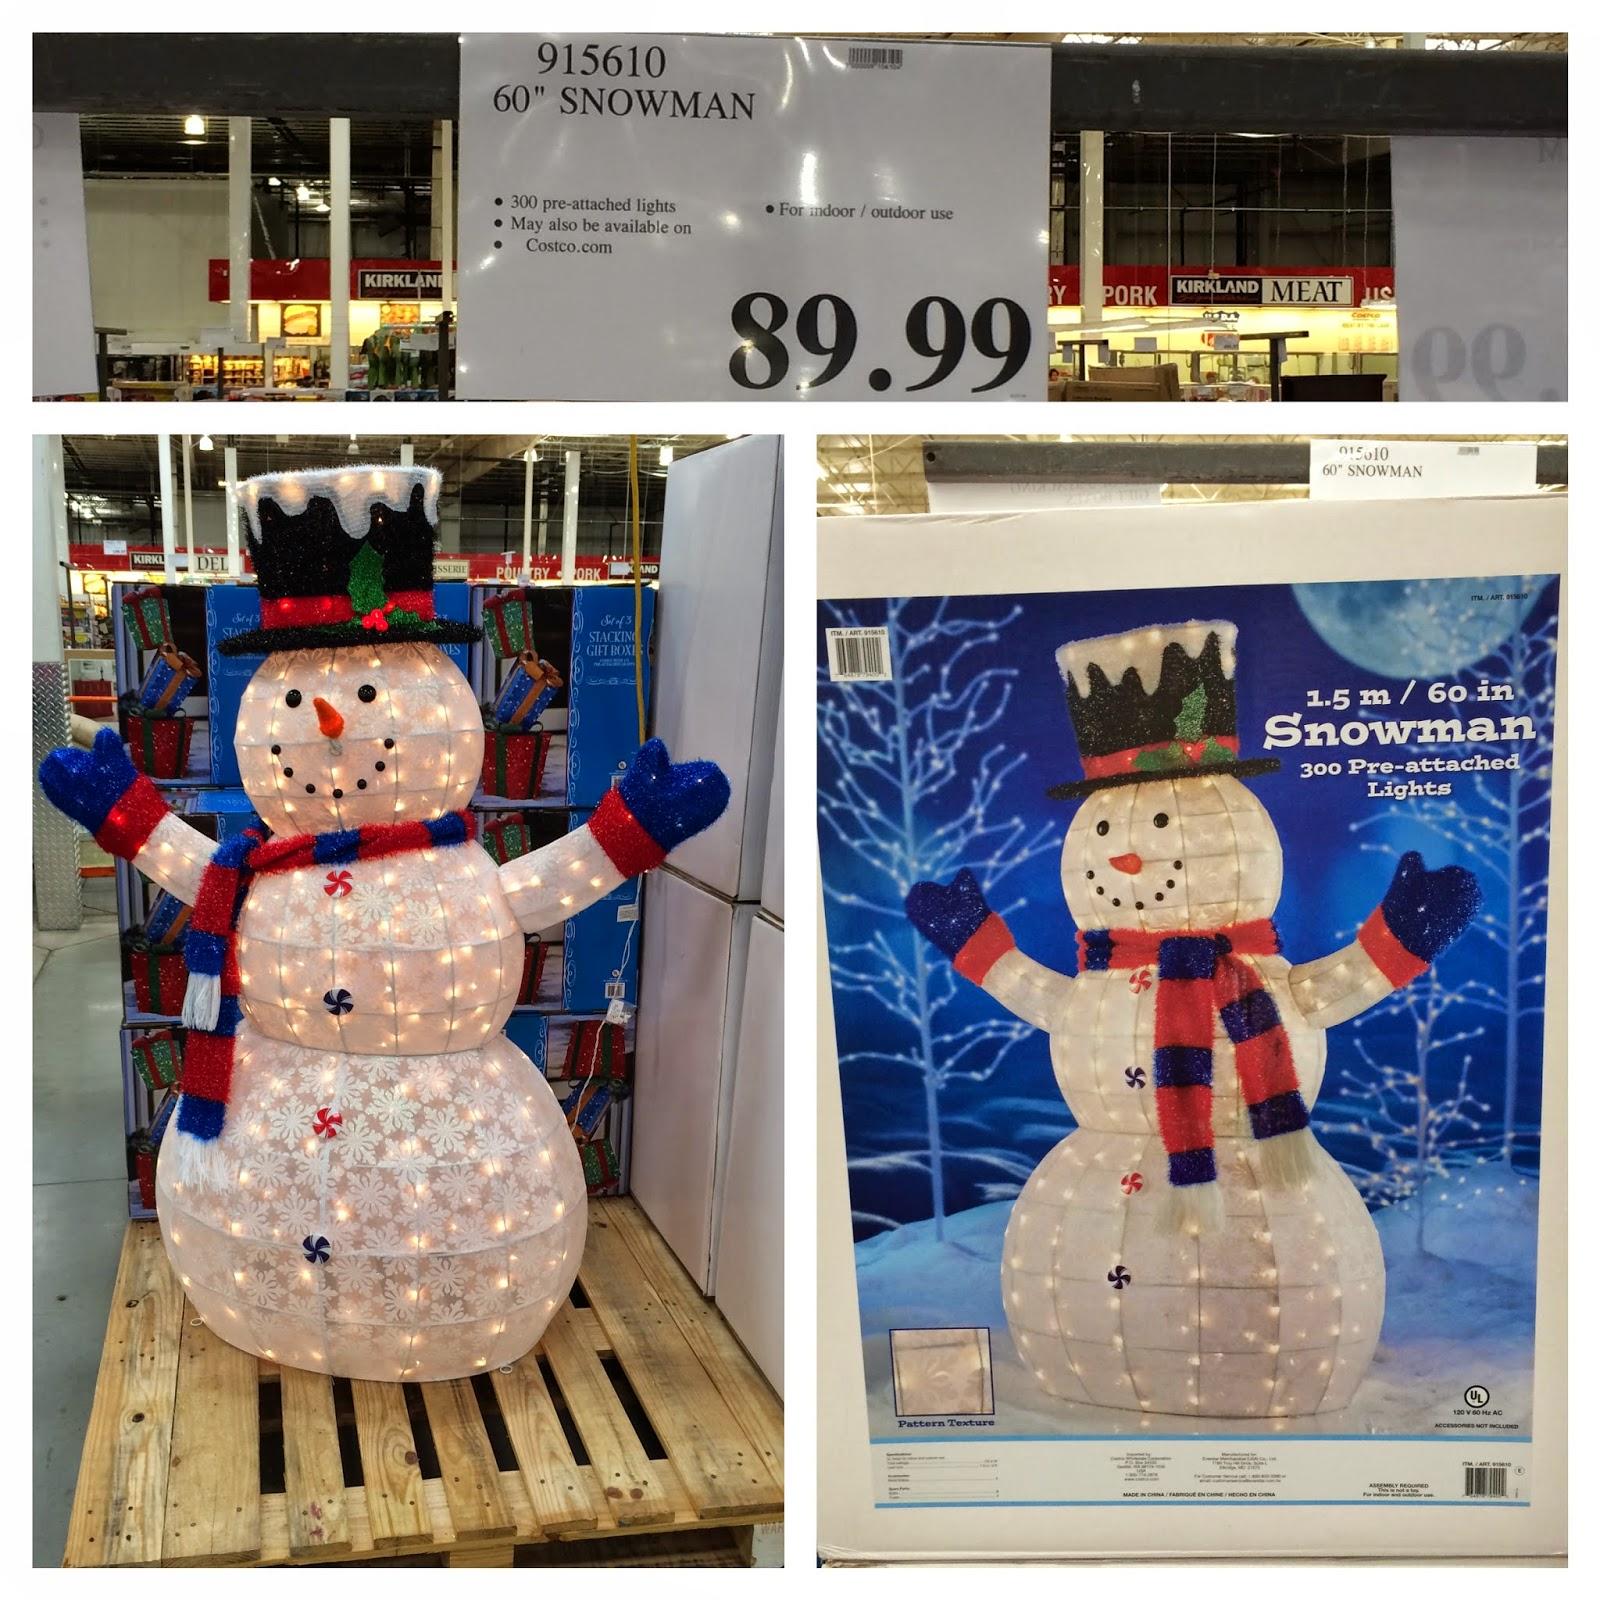 Costco Led Christmas Tree: 'Tis The Season At Costco!